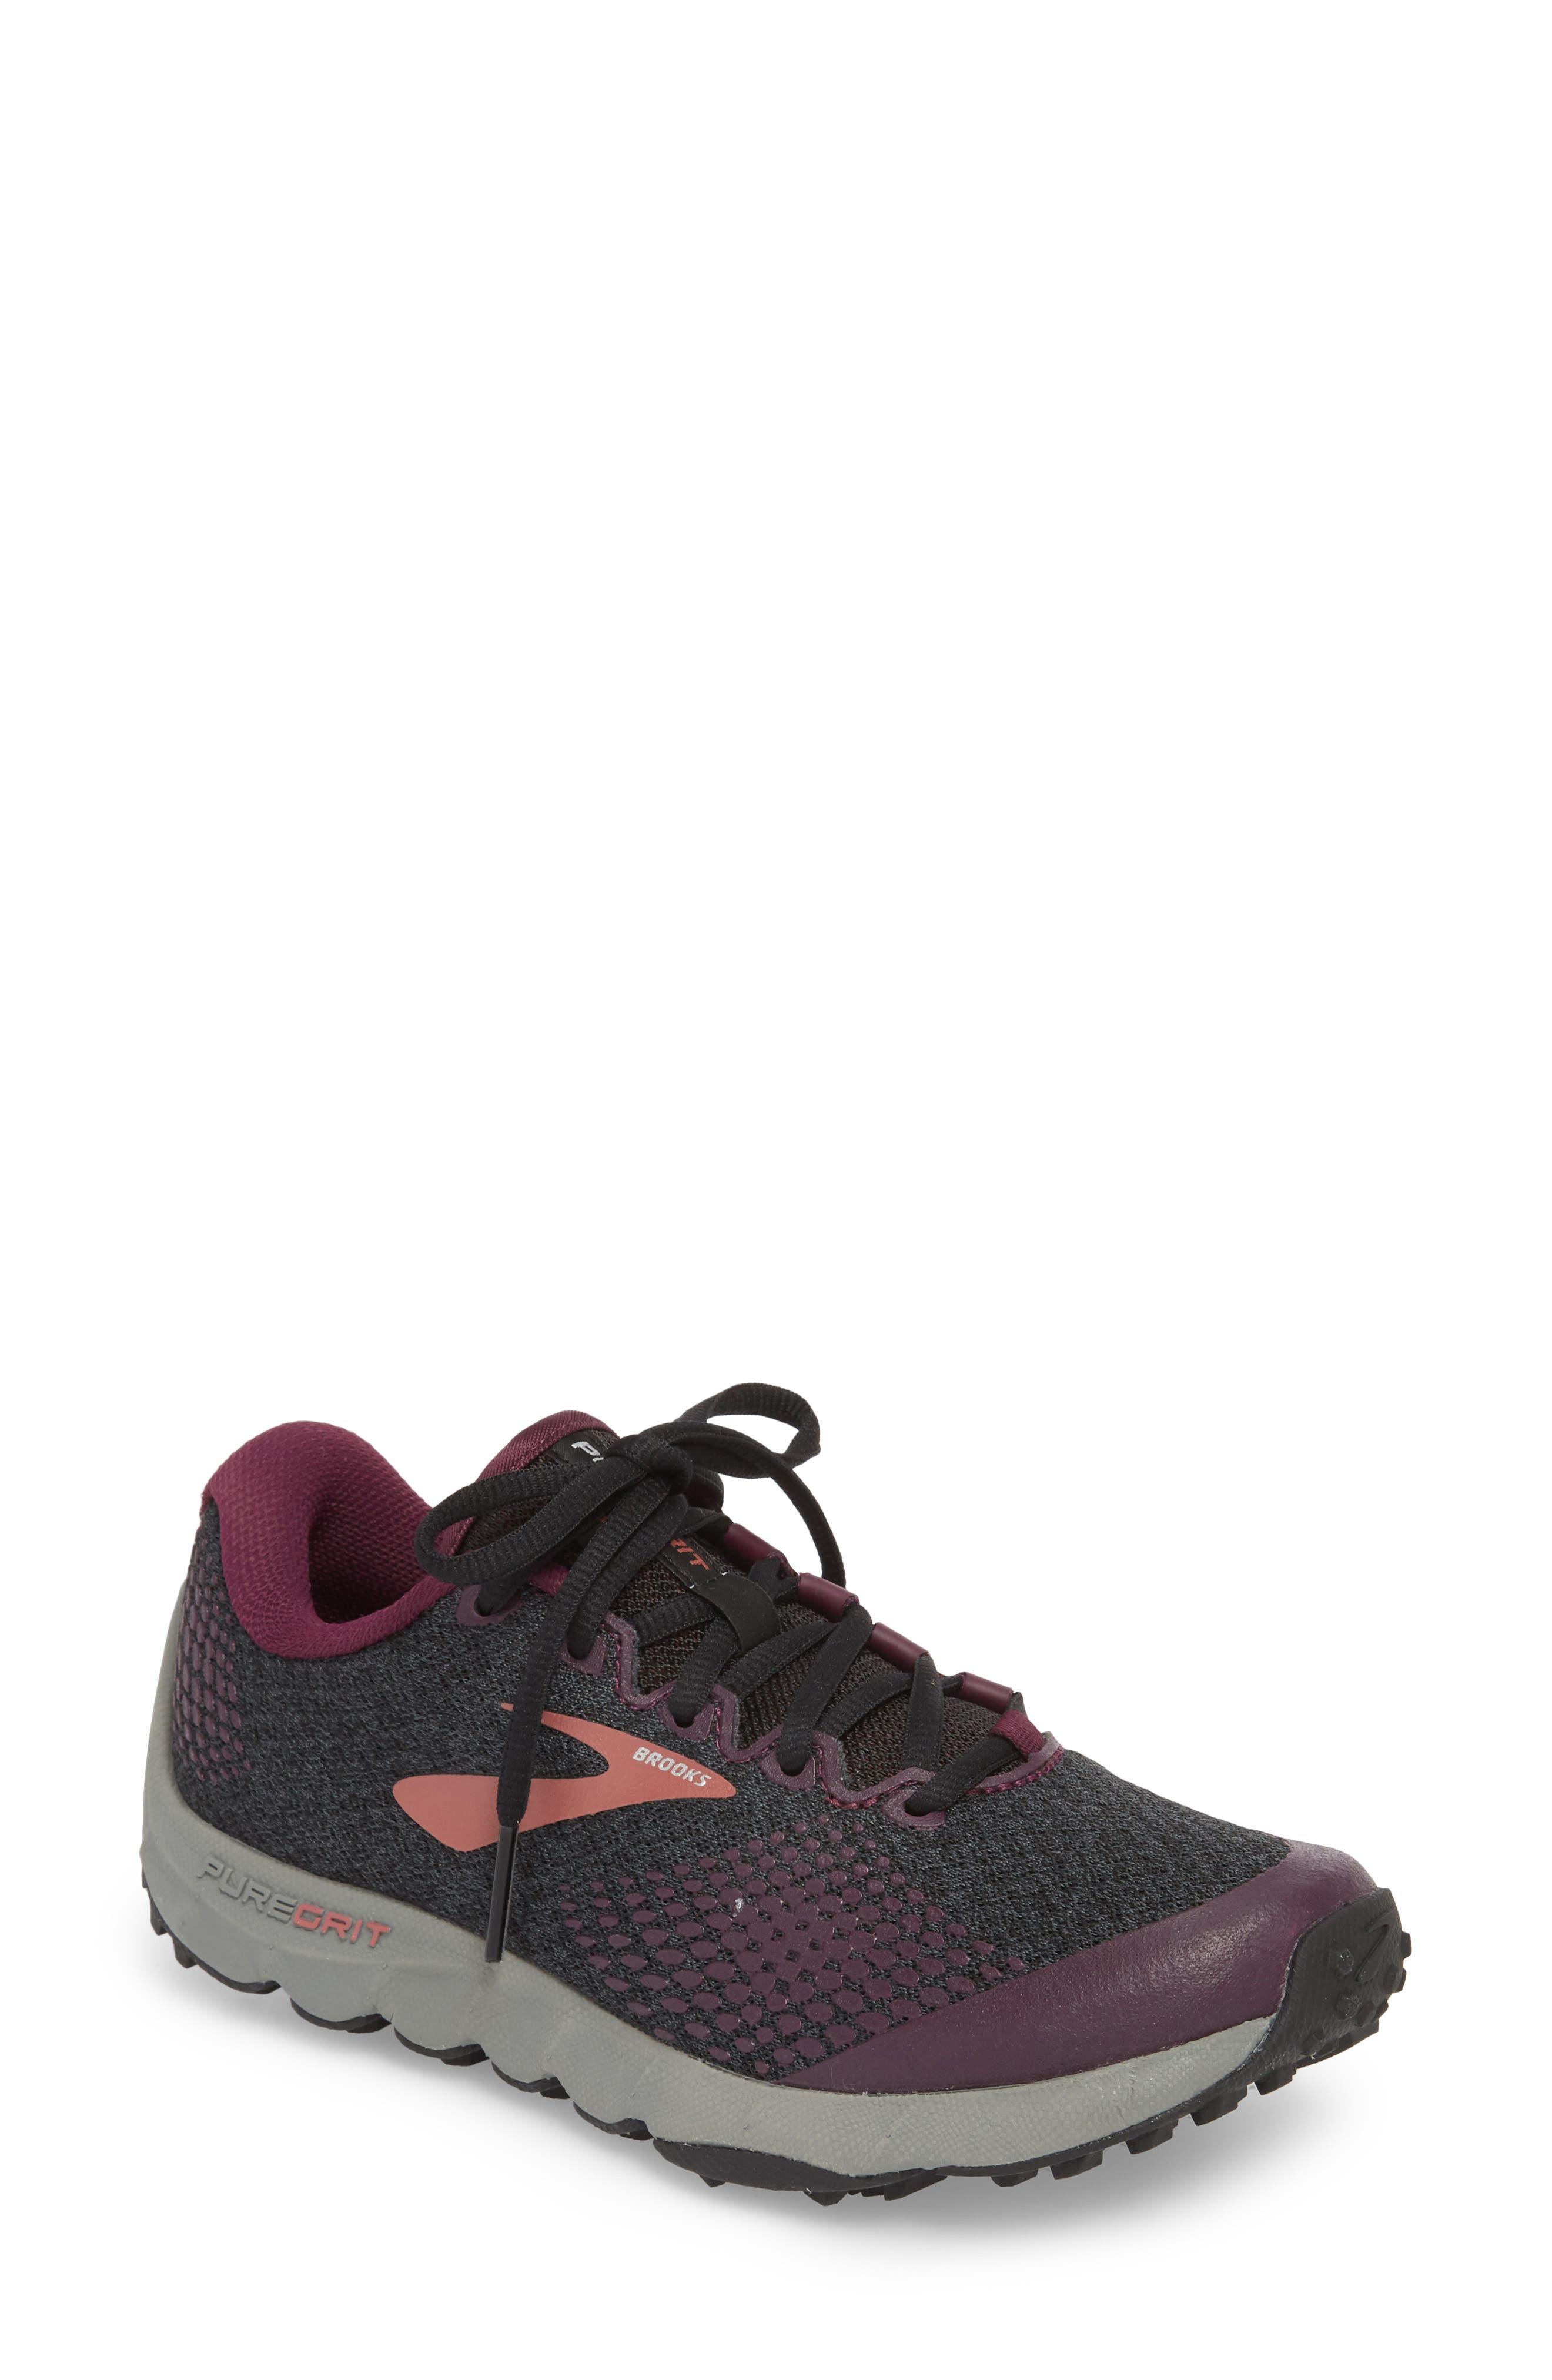 PureGrit 7 Trail Running Shoe,                             Main thumbnail 1, color,                             BLACK/ PURPLE/ GREY